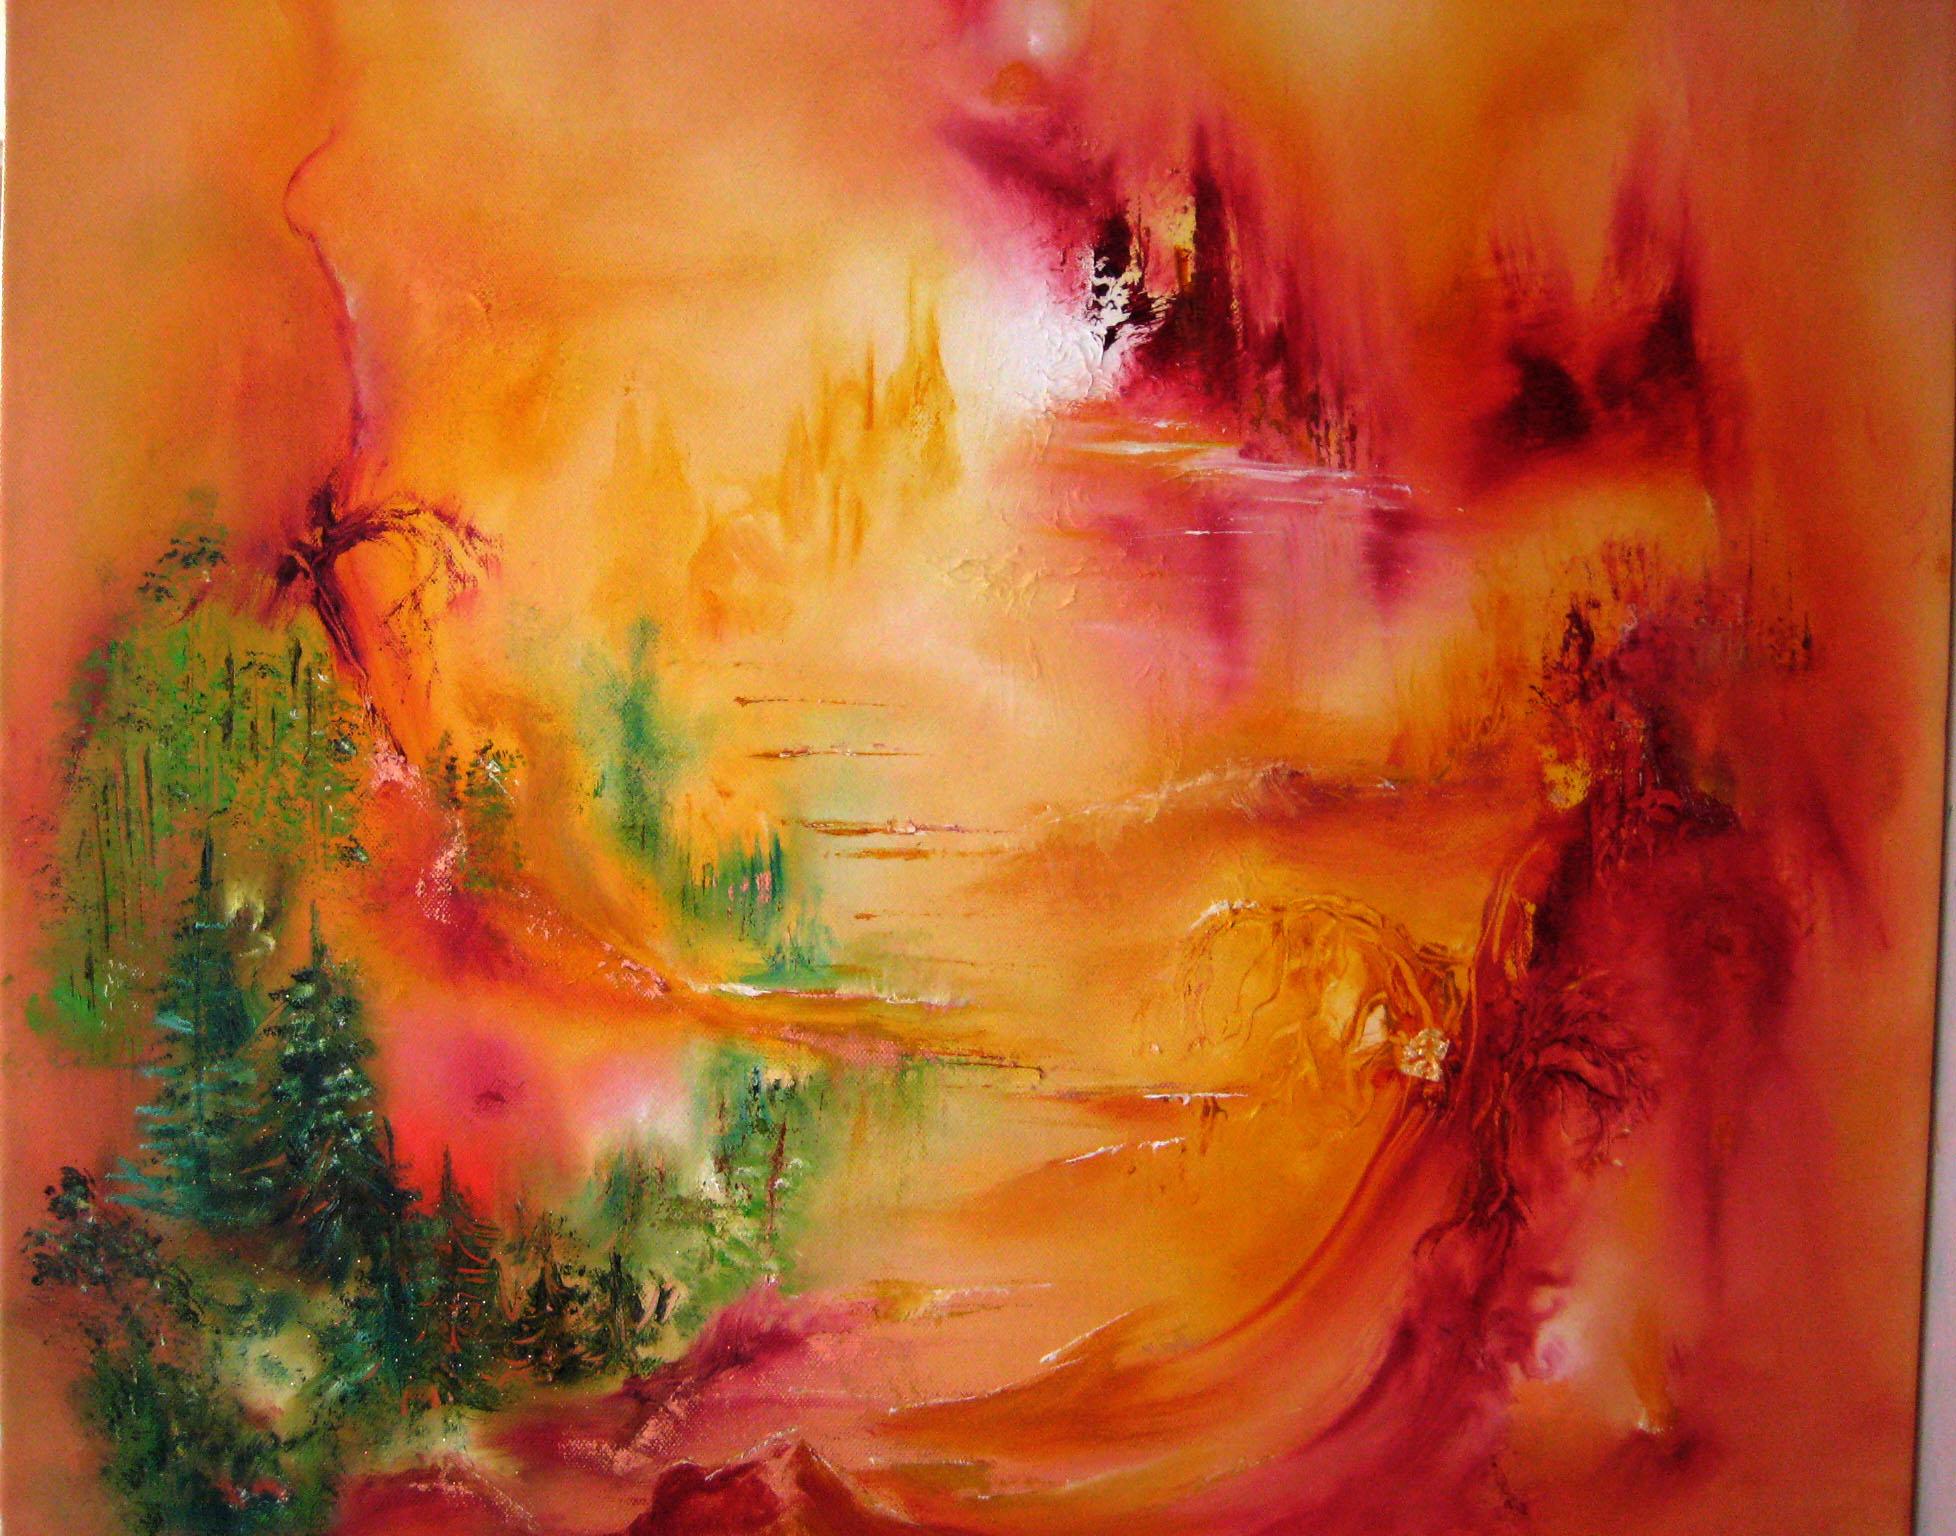 Orange city-oilpainting by Jacqueline Ostrowski-deep colouers- dimensioner-art-spiritual art-painter-artist-Jacqueline Ostrowski-spirituelart.dk